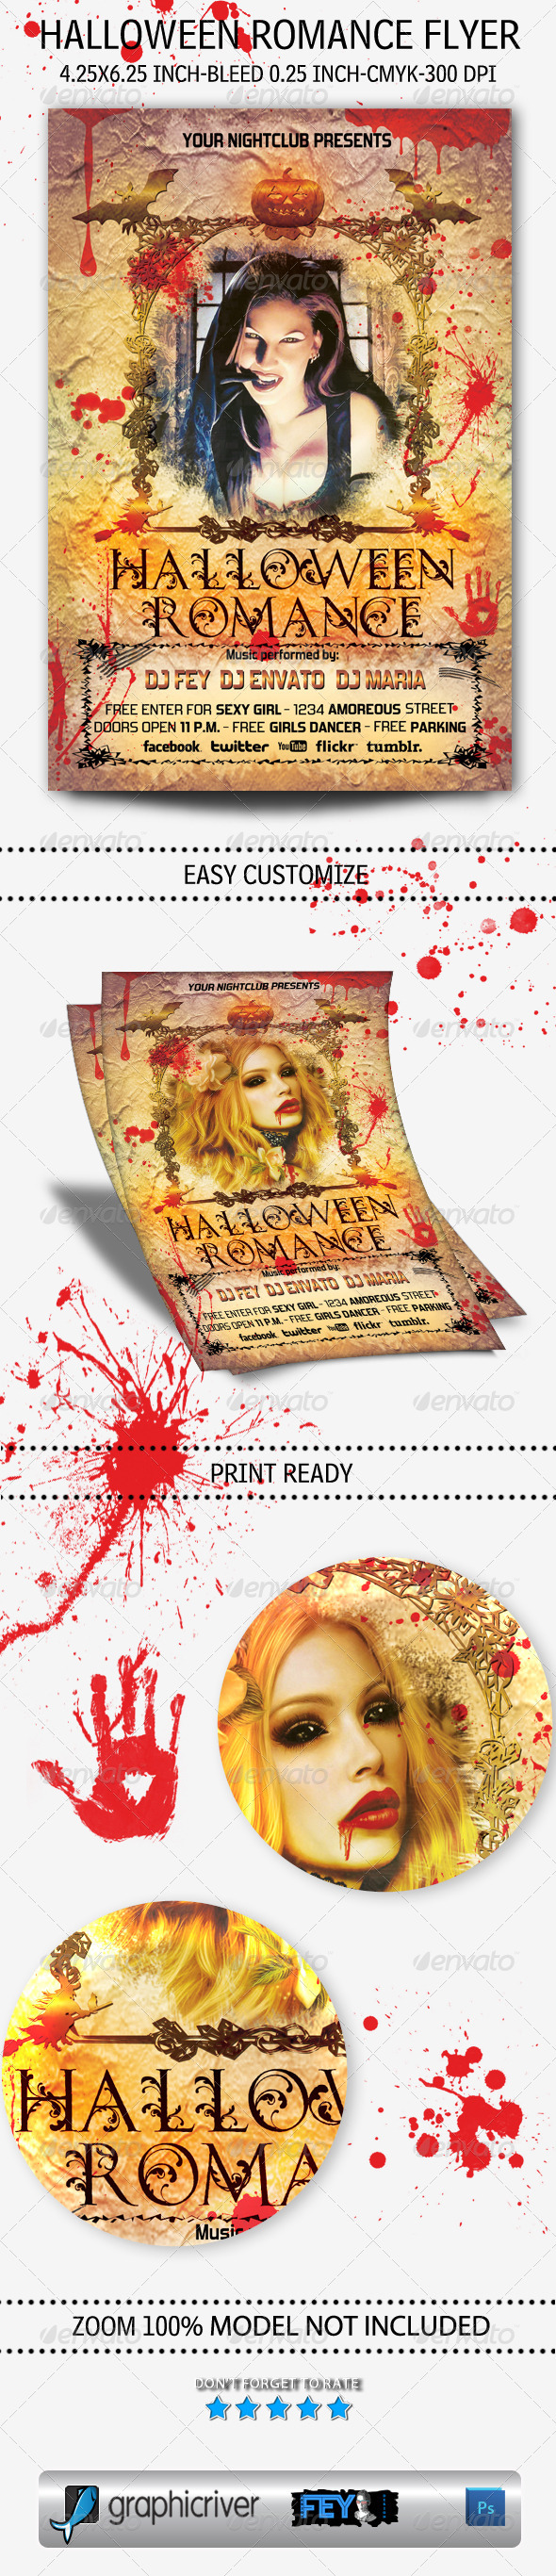 Halloween Romance Flyer